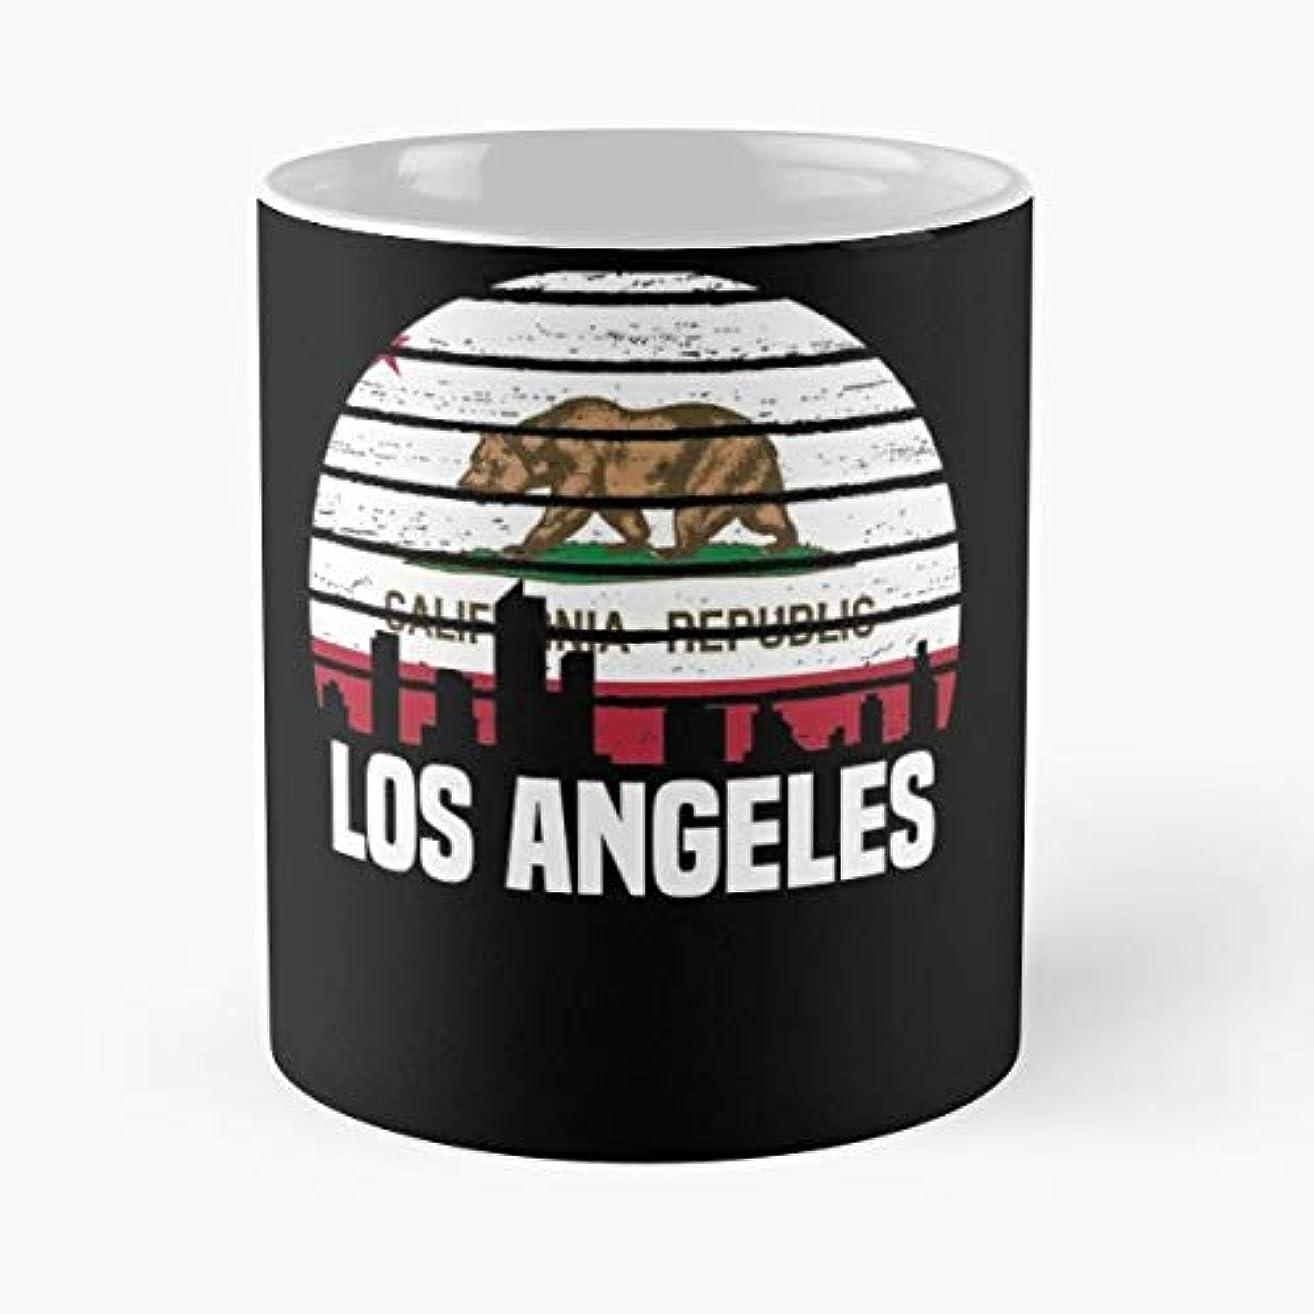 Los Angeles California - Coffee Mugs Unique Ceramic Novelty Cup